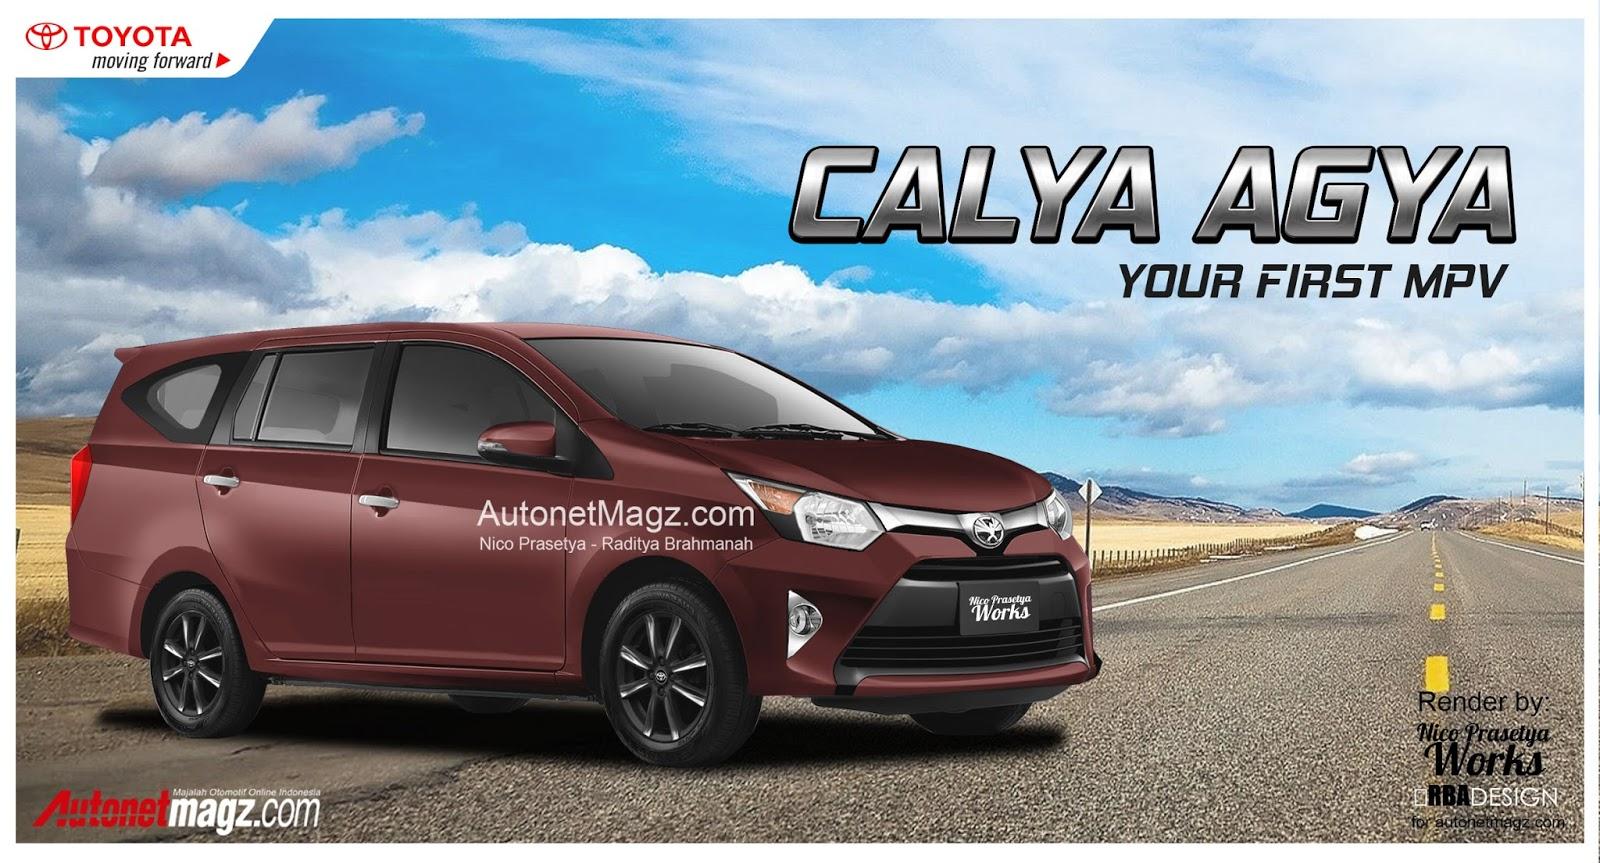 Dealer Toyota Calya Indramayu 085647897006 Wa Daftar Harga Terbaru Mobil Toyota New Calya Wilayah Indramayu Jawa Barat 2016